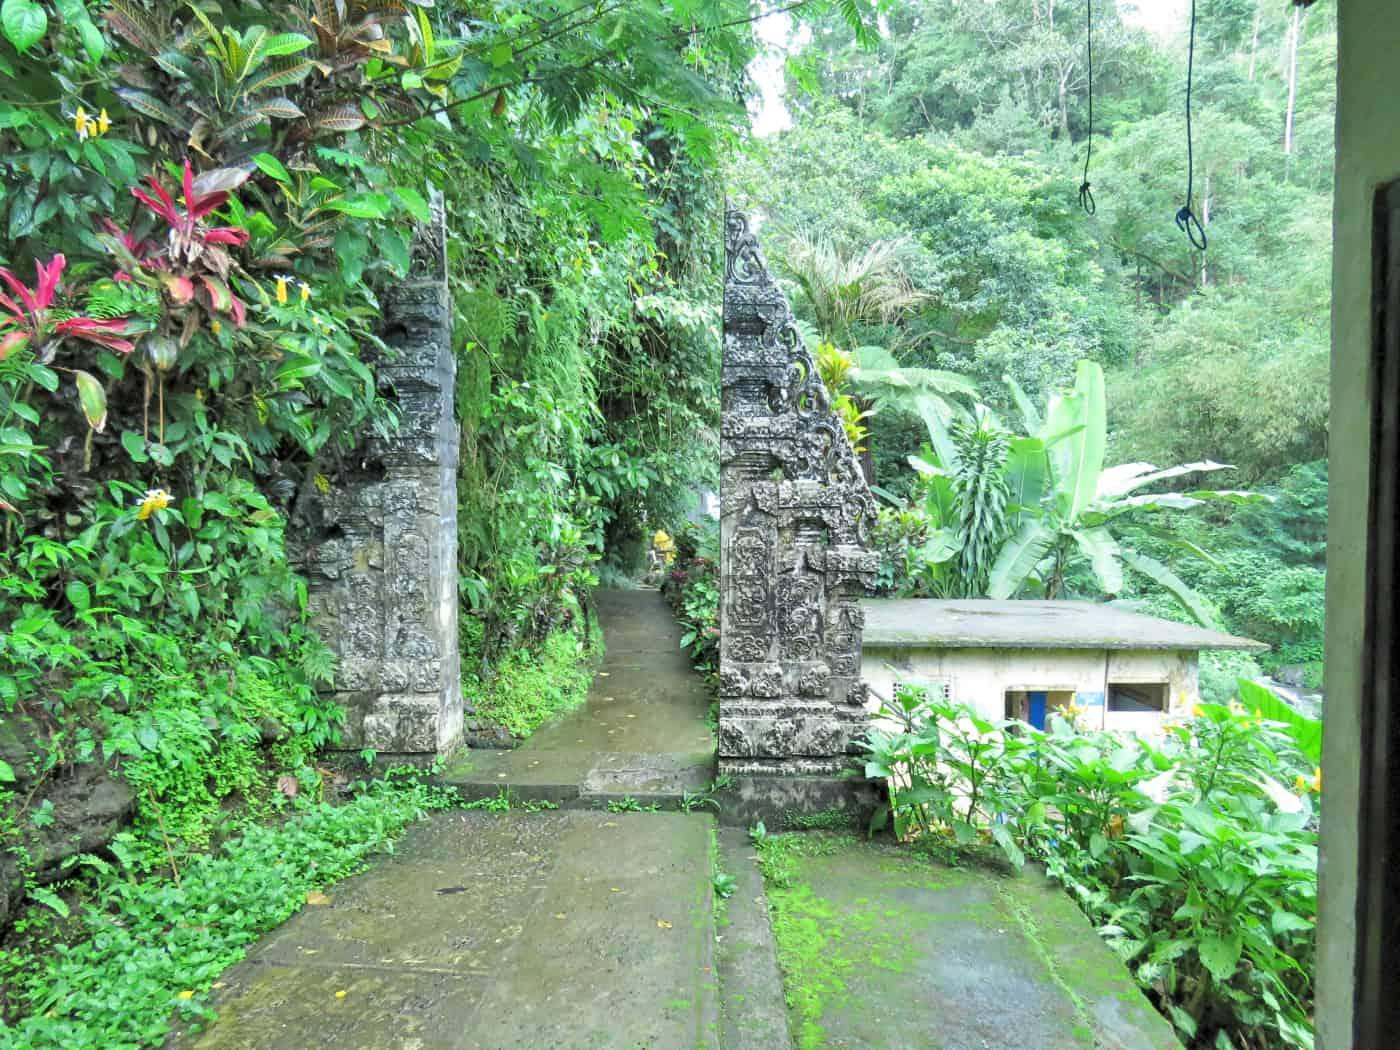 gogirlrun_bali_indonesien_privatetour_norden_gitgit_waterfall_67